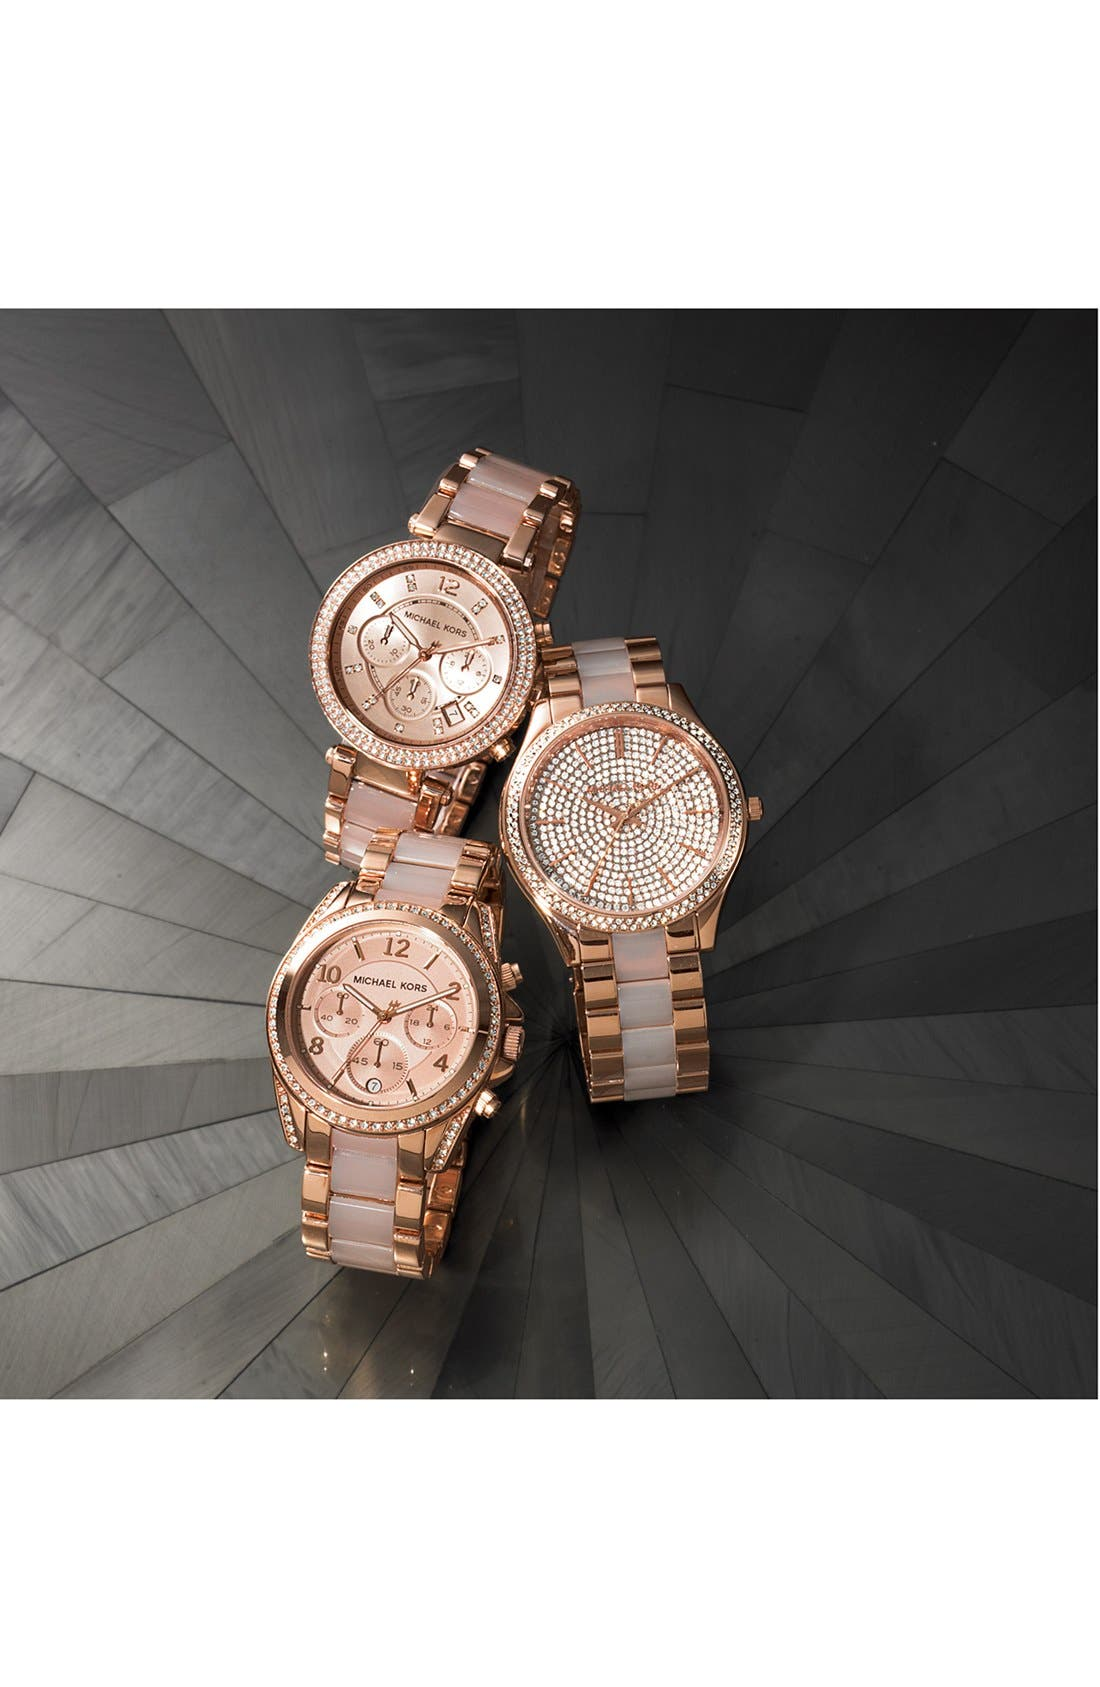 MICHAEL KORS,                             'Blair' Crystal Bezel Two-Tone Bracelet Watch, 39mm,                             Alternate thumbnail 3, color,                             040